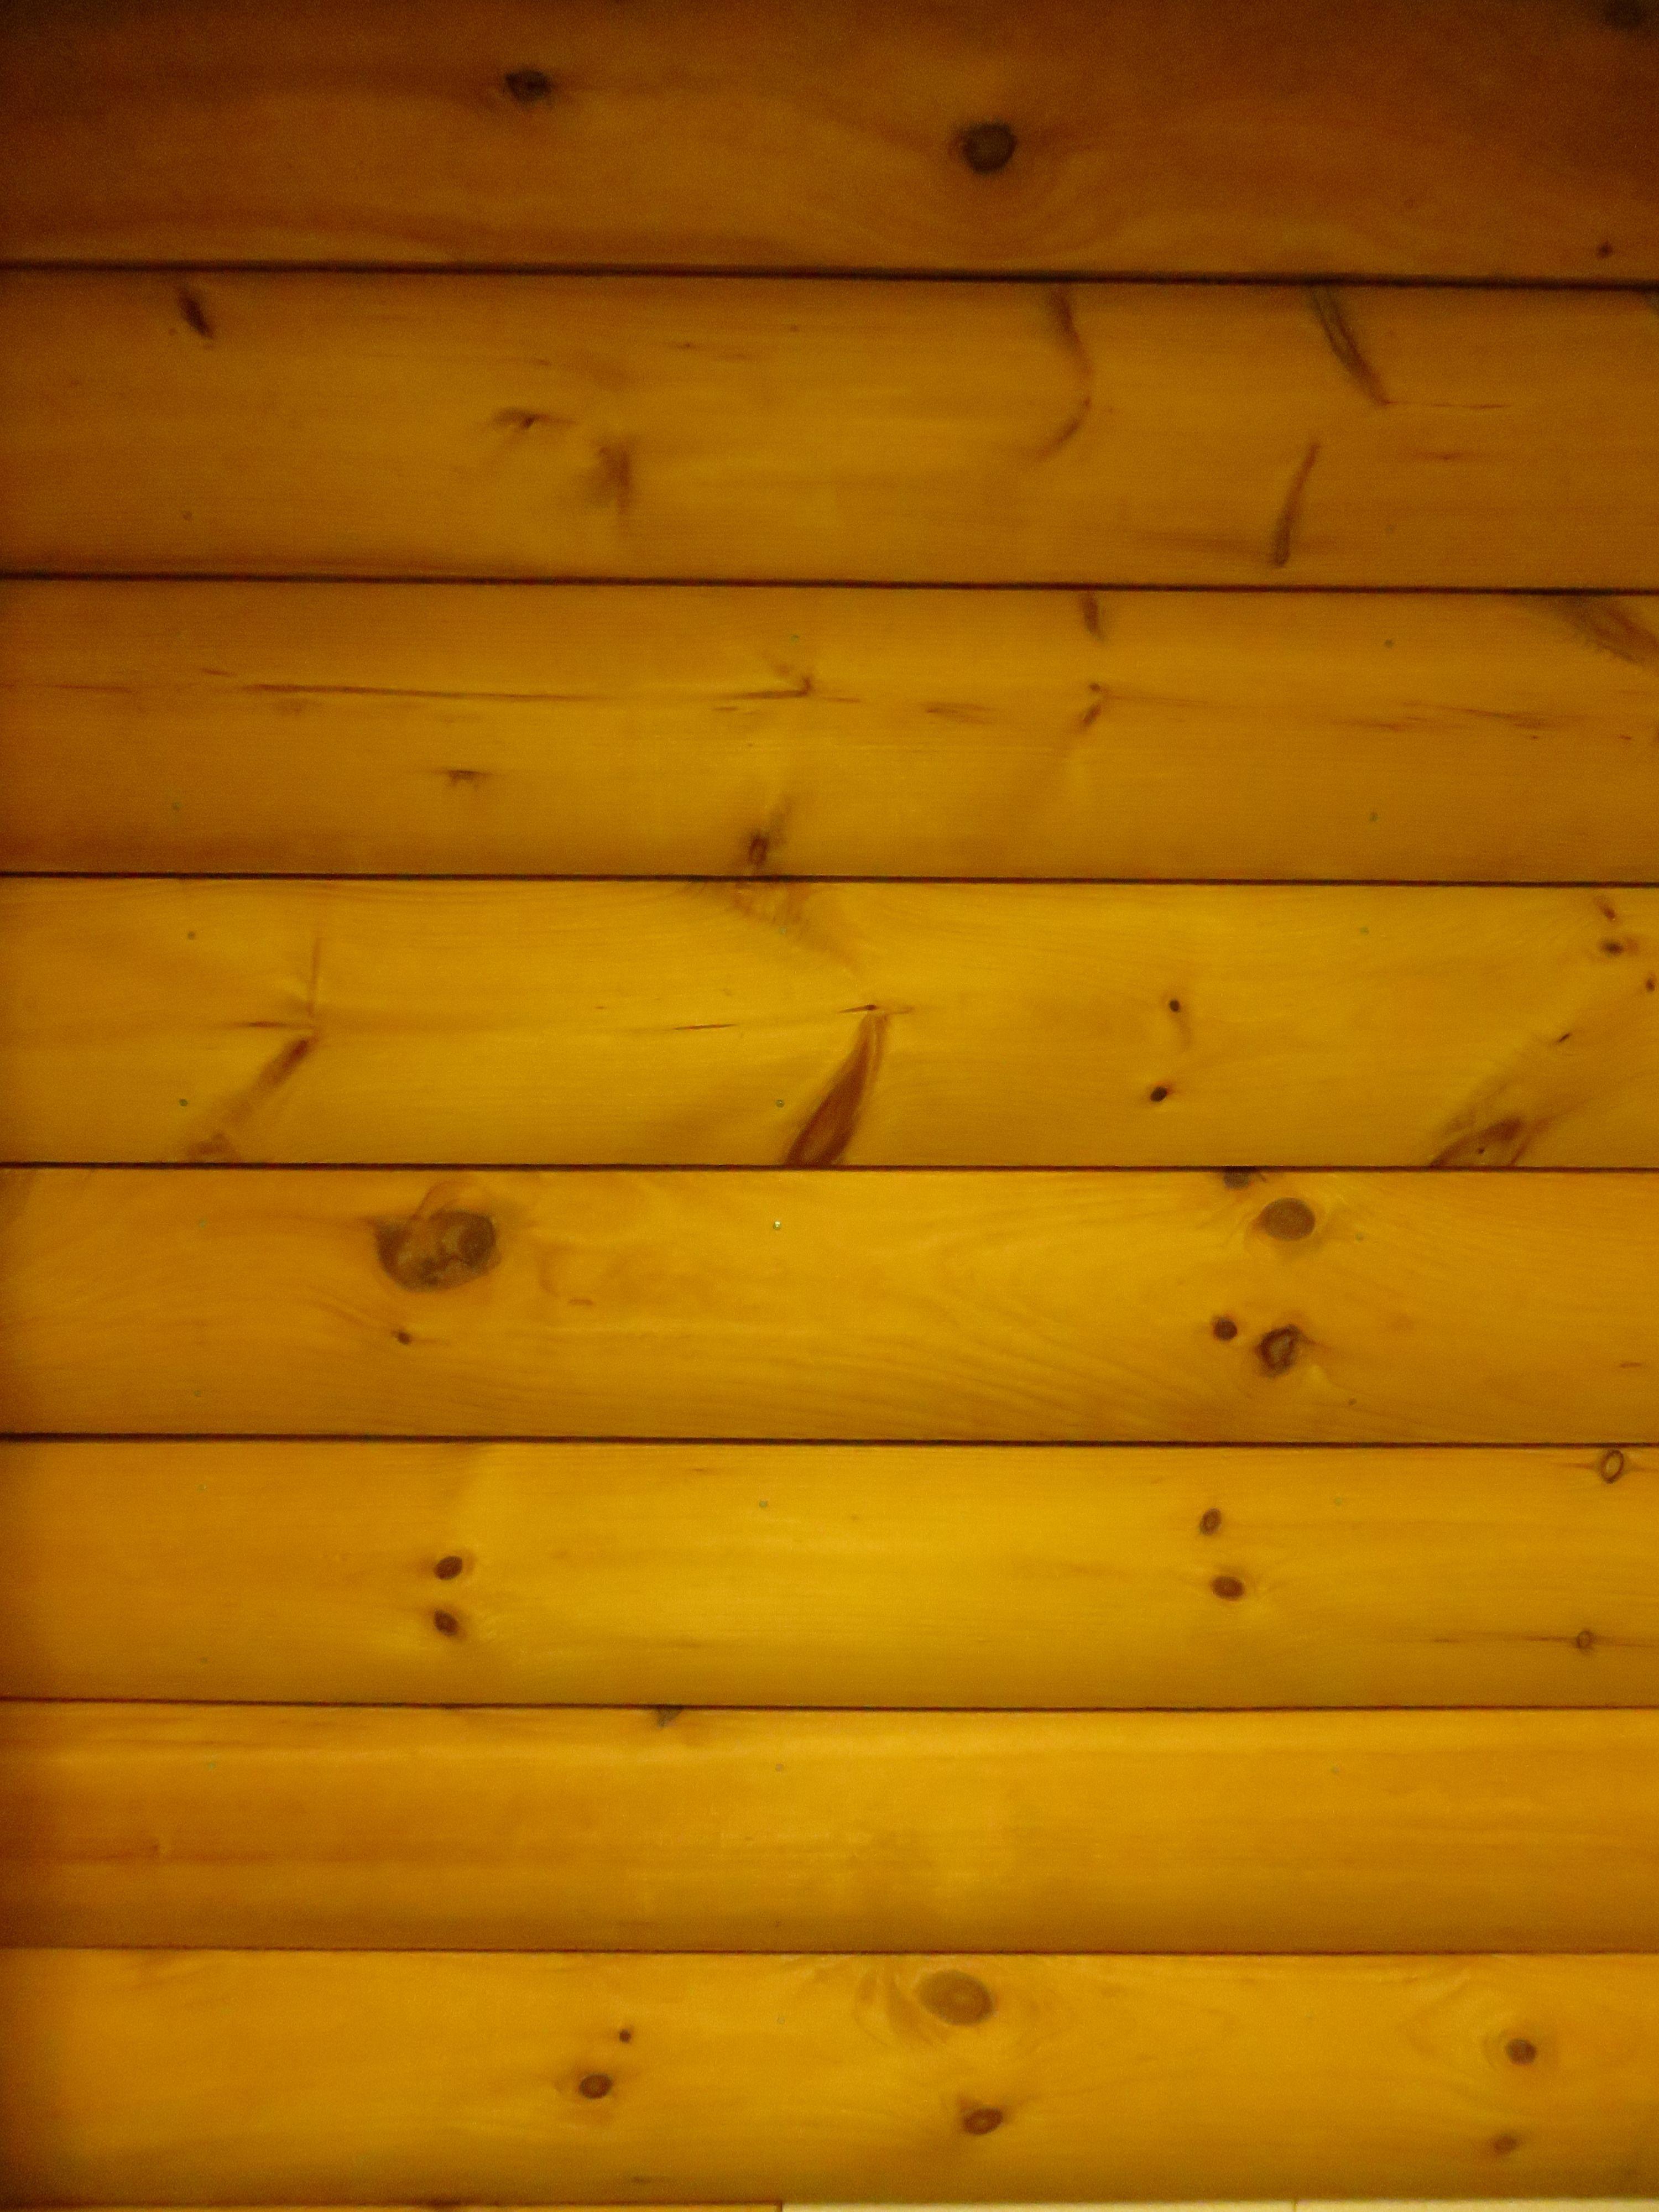 3x8 log siding hand hewn pine - Meadow Valley Log Homes Log Siding Finished Inside Corner Using Our Inside 1 4 Log And 2 X 10 Supersiding Pinterest Log Siding